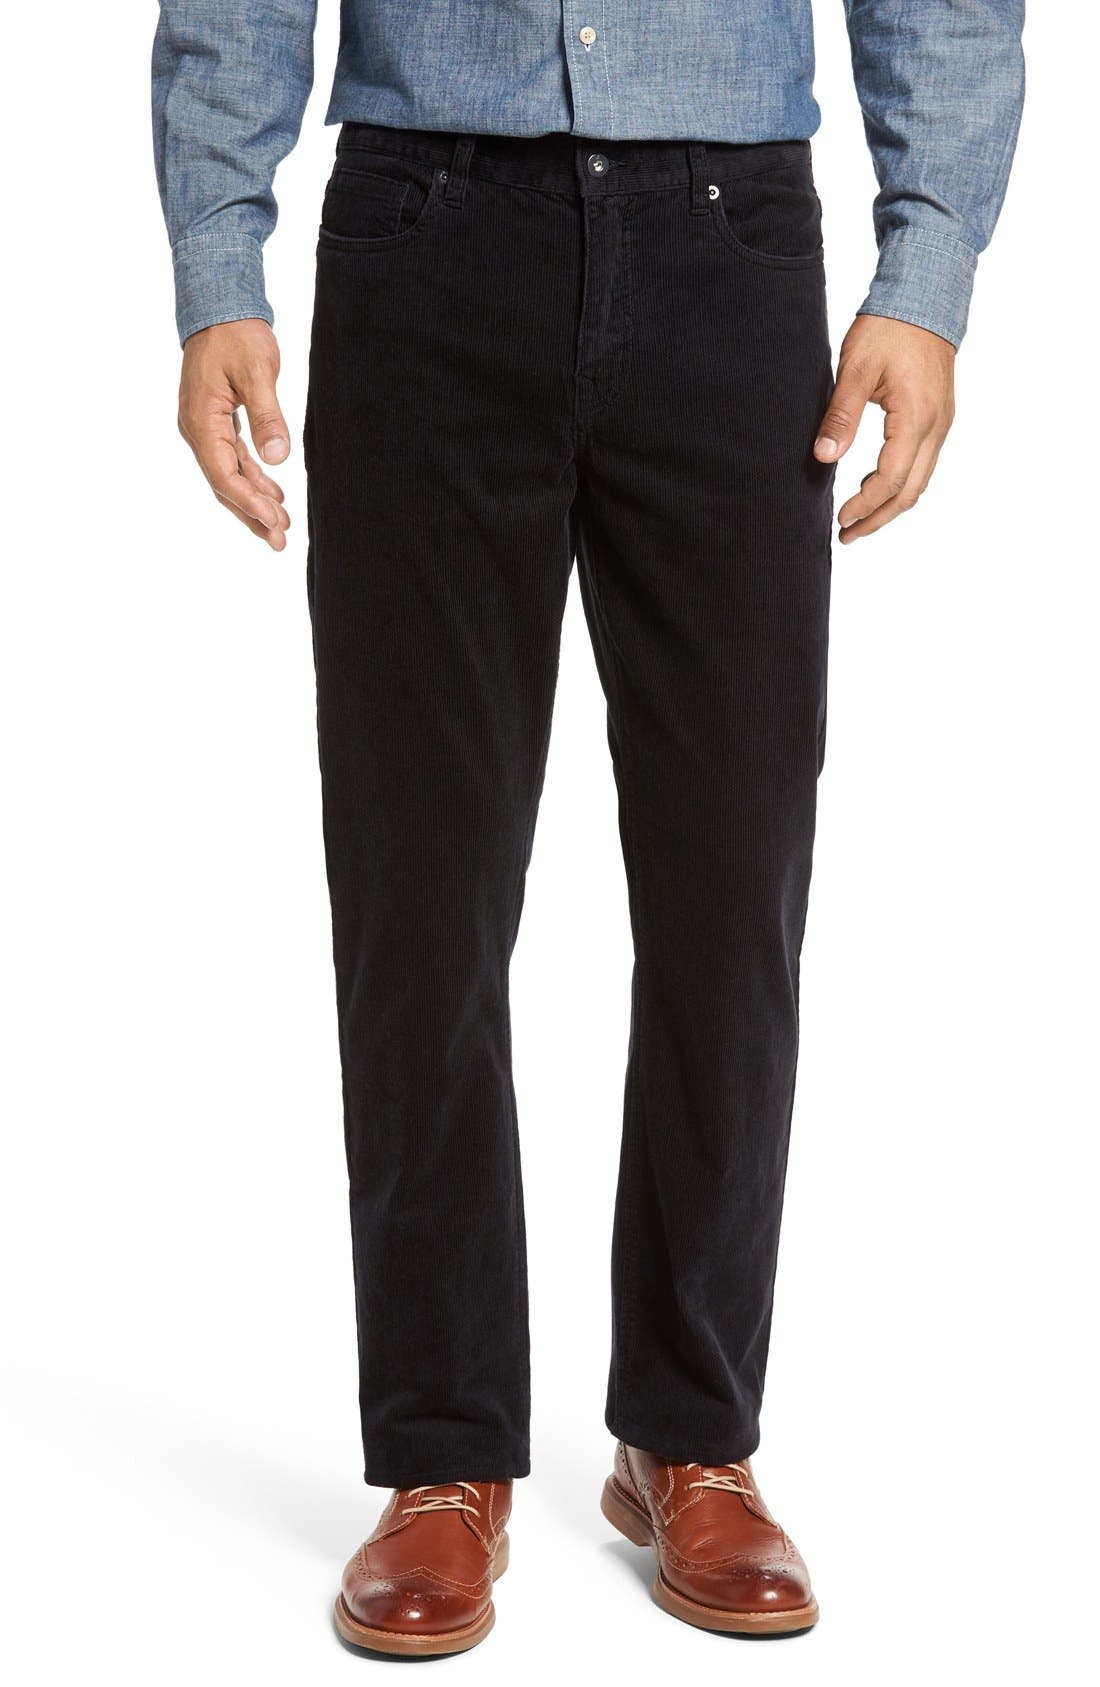 Greenwood Stretch Corduroy Pants,                         Main,                         color, 001